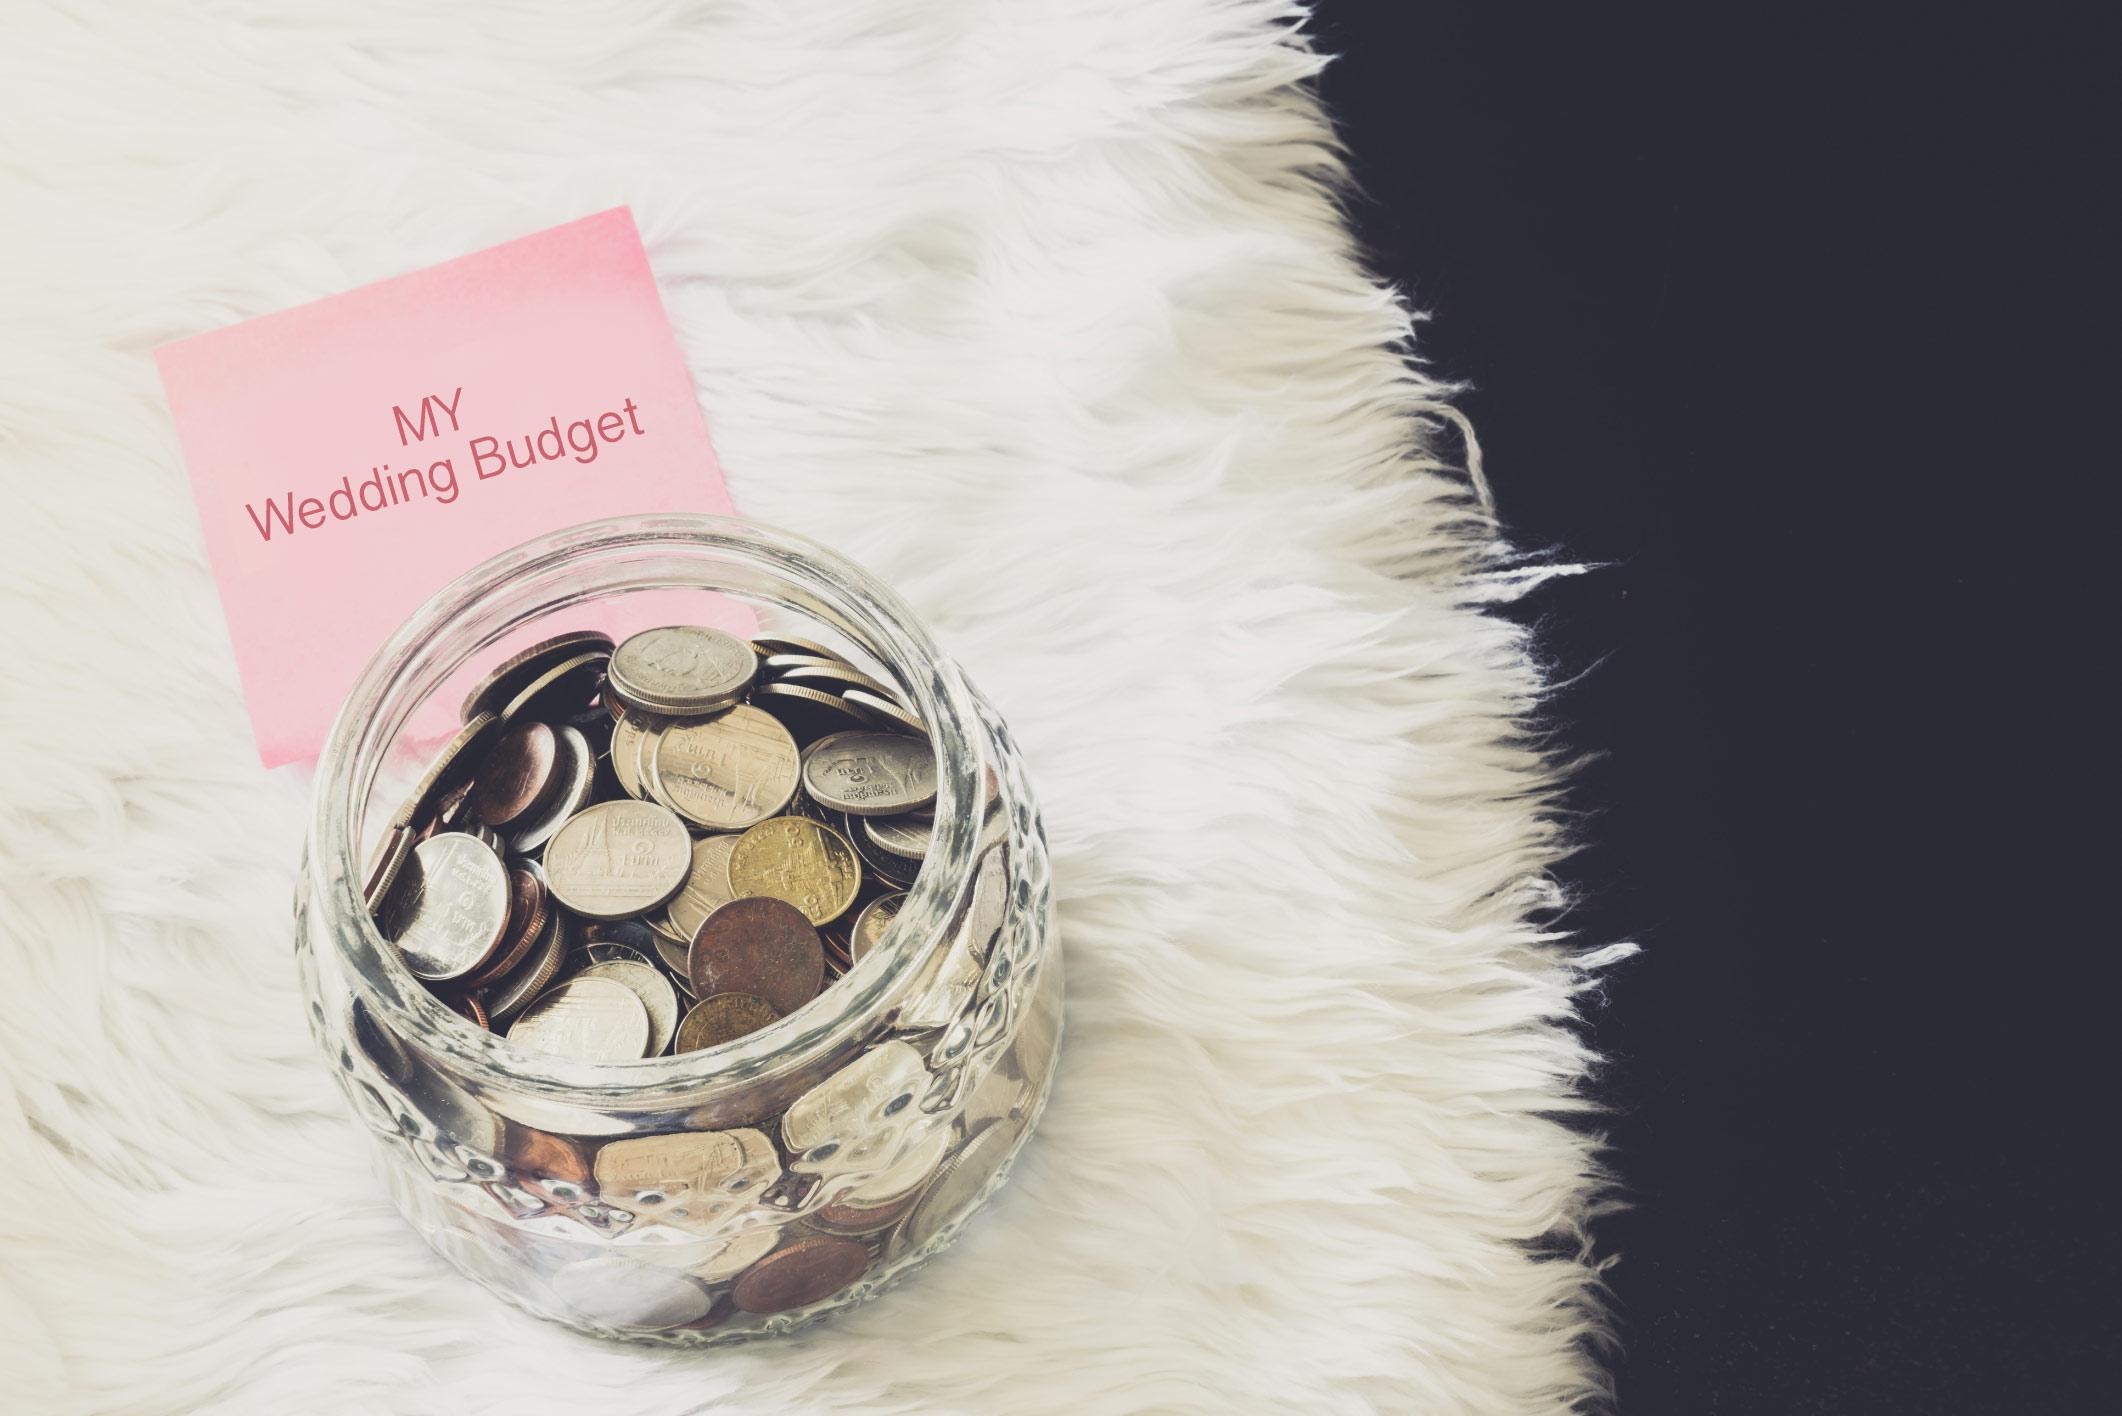 wedding budget: quanto costa un matrimonio economico